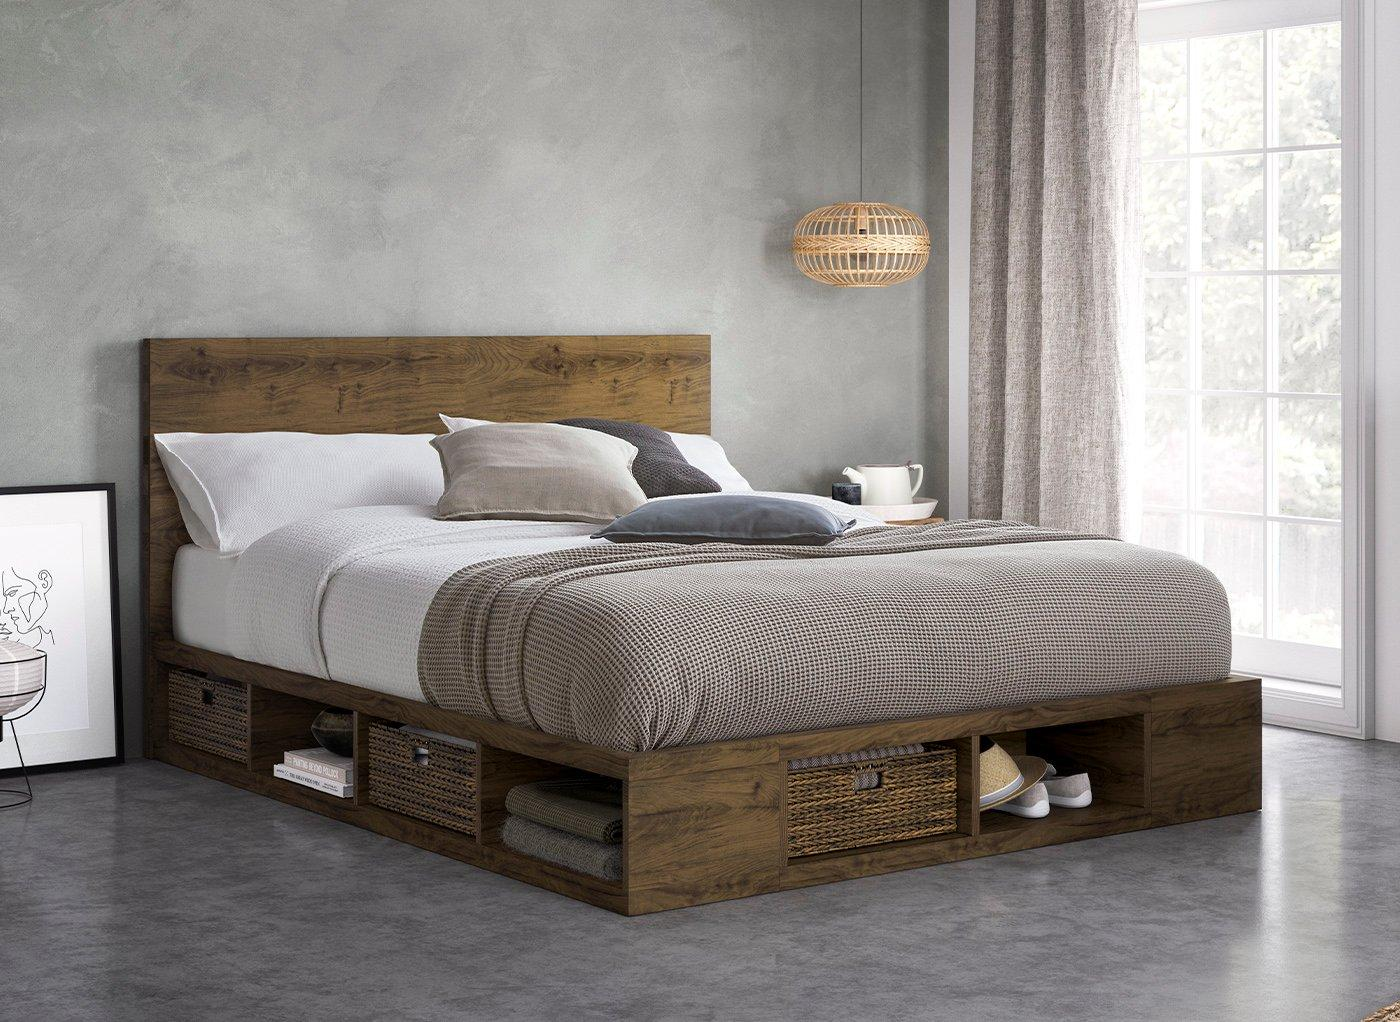 Wilkes Wooden Storage Bed Frame